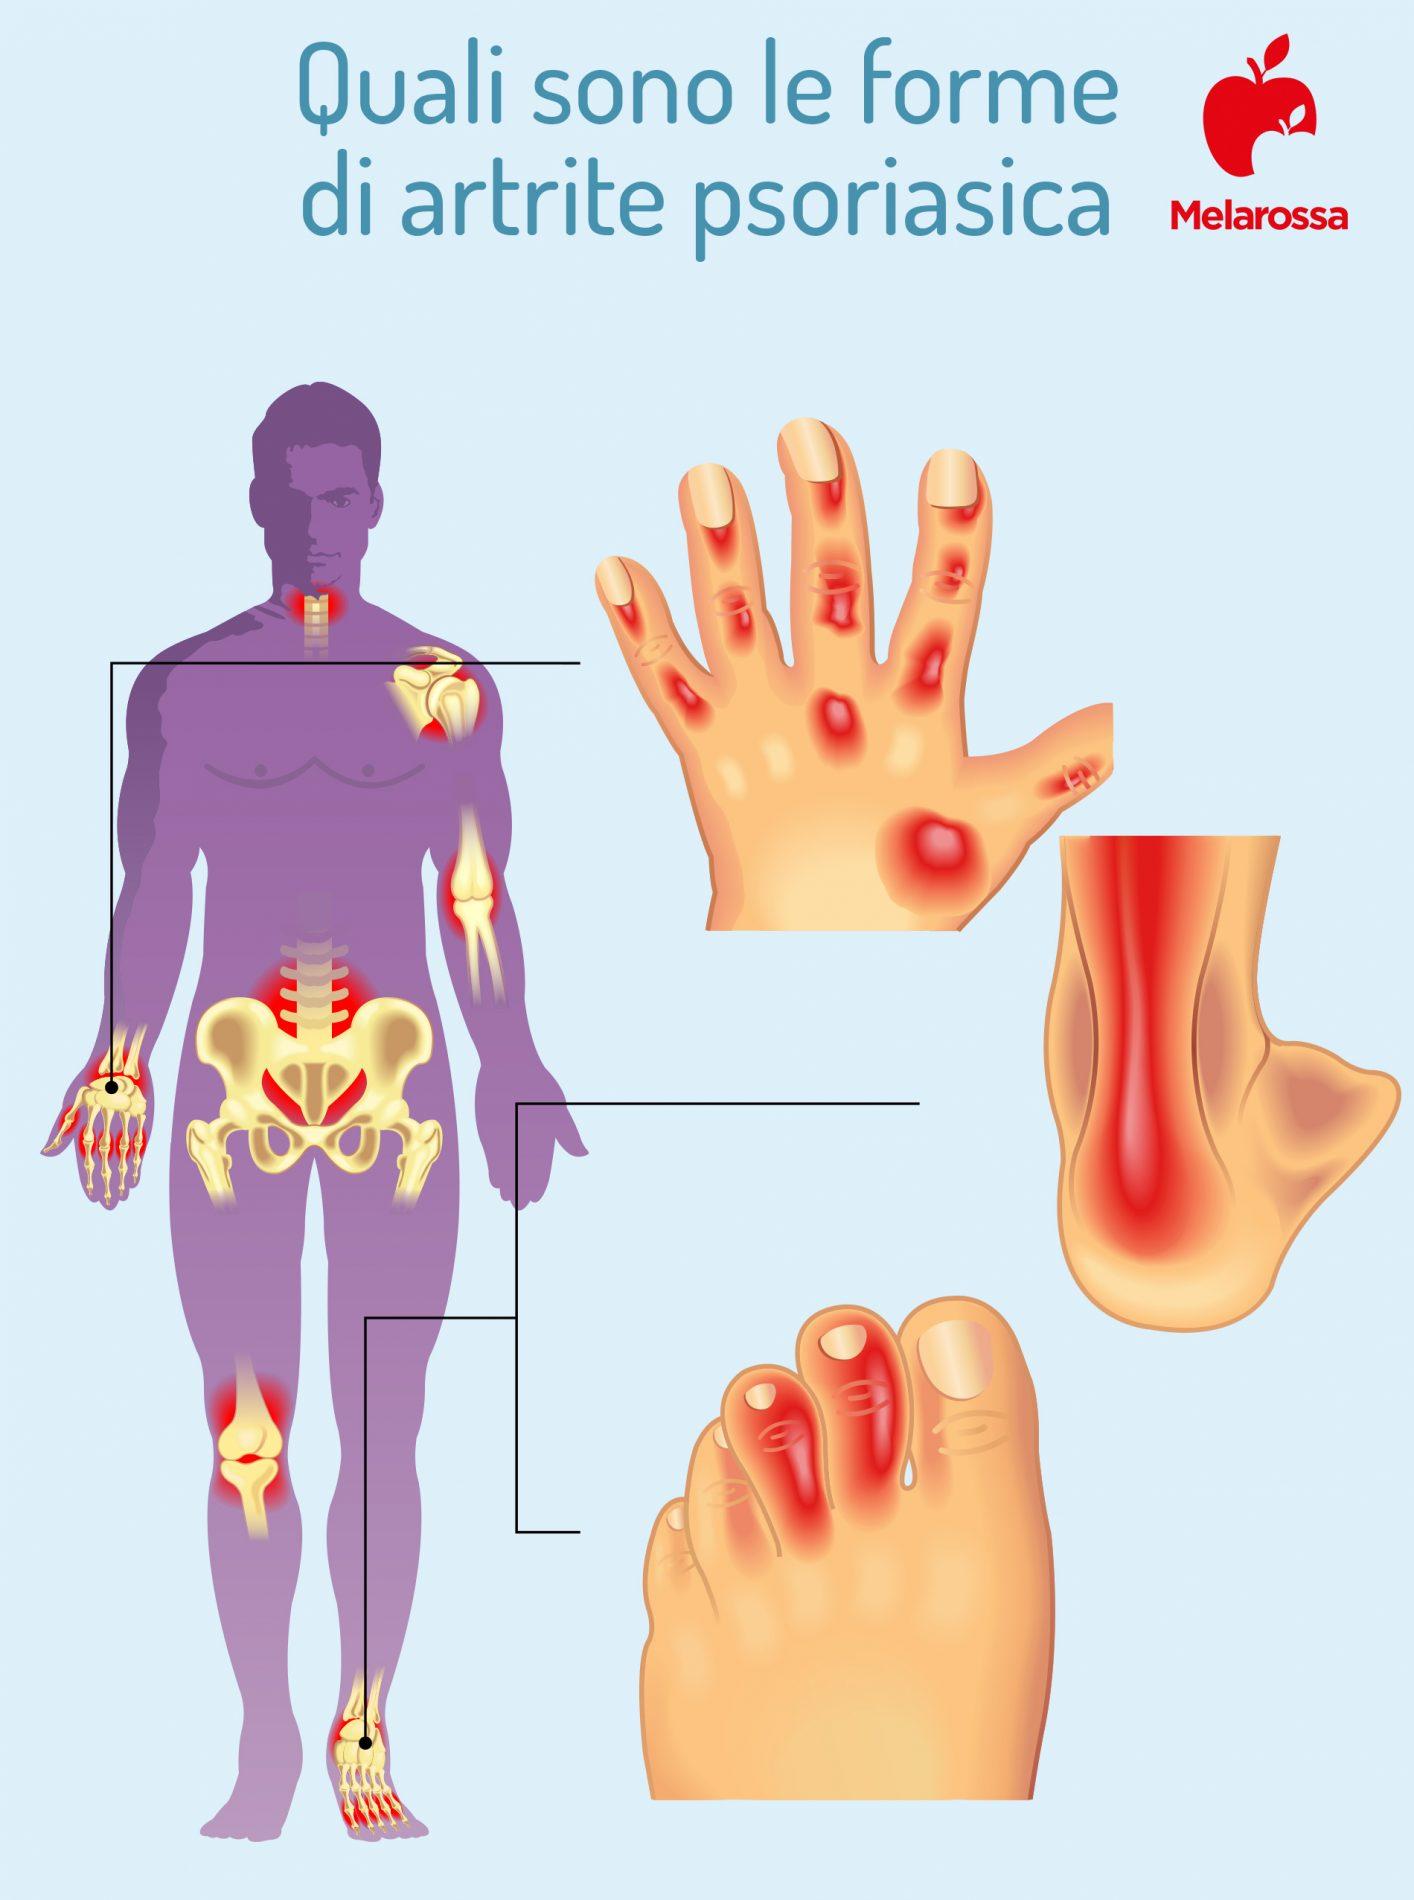 artrite psoriasica: forme